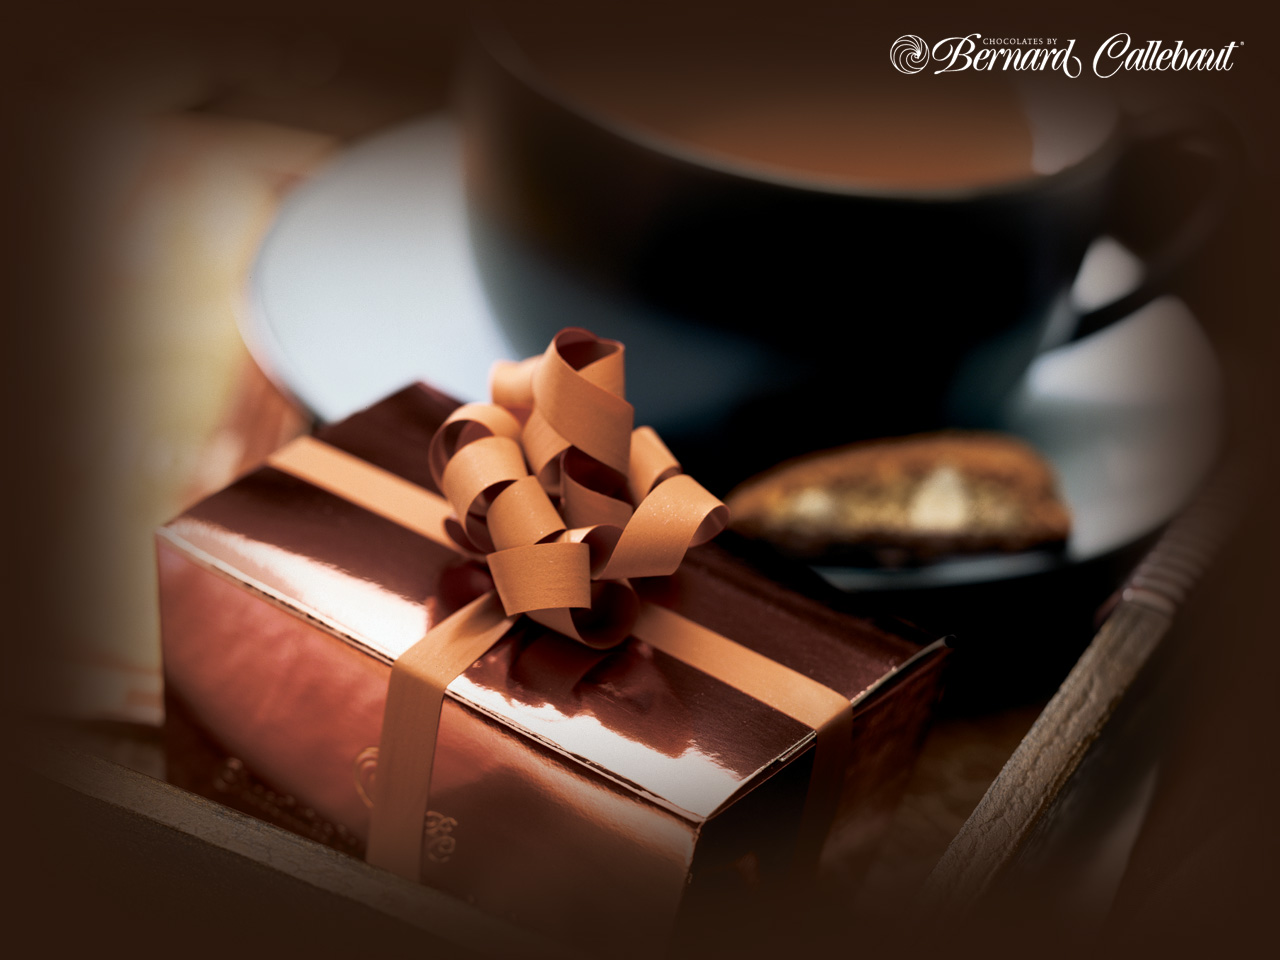 Chocolaterie Bernard Callebaut Chocolate Photo 789842